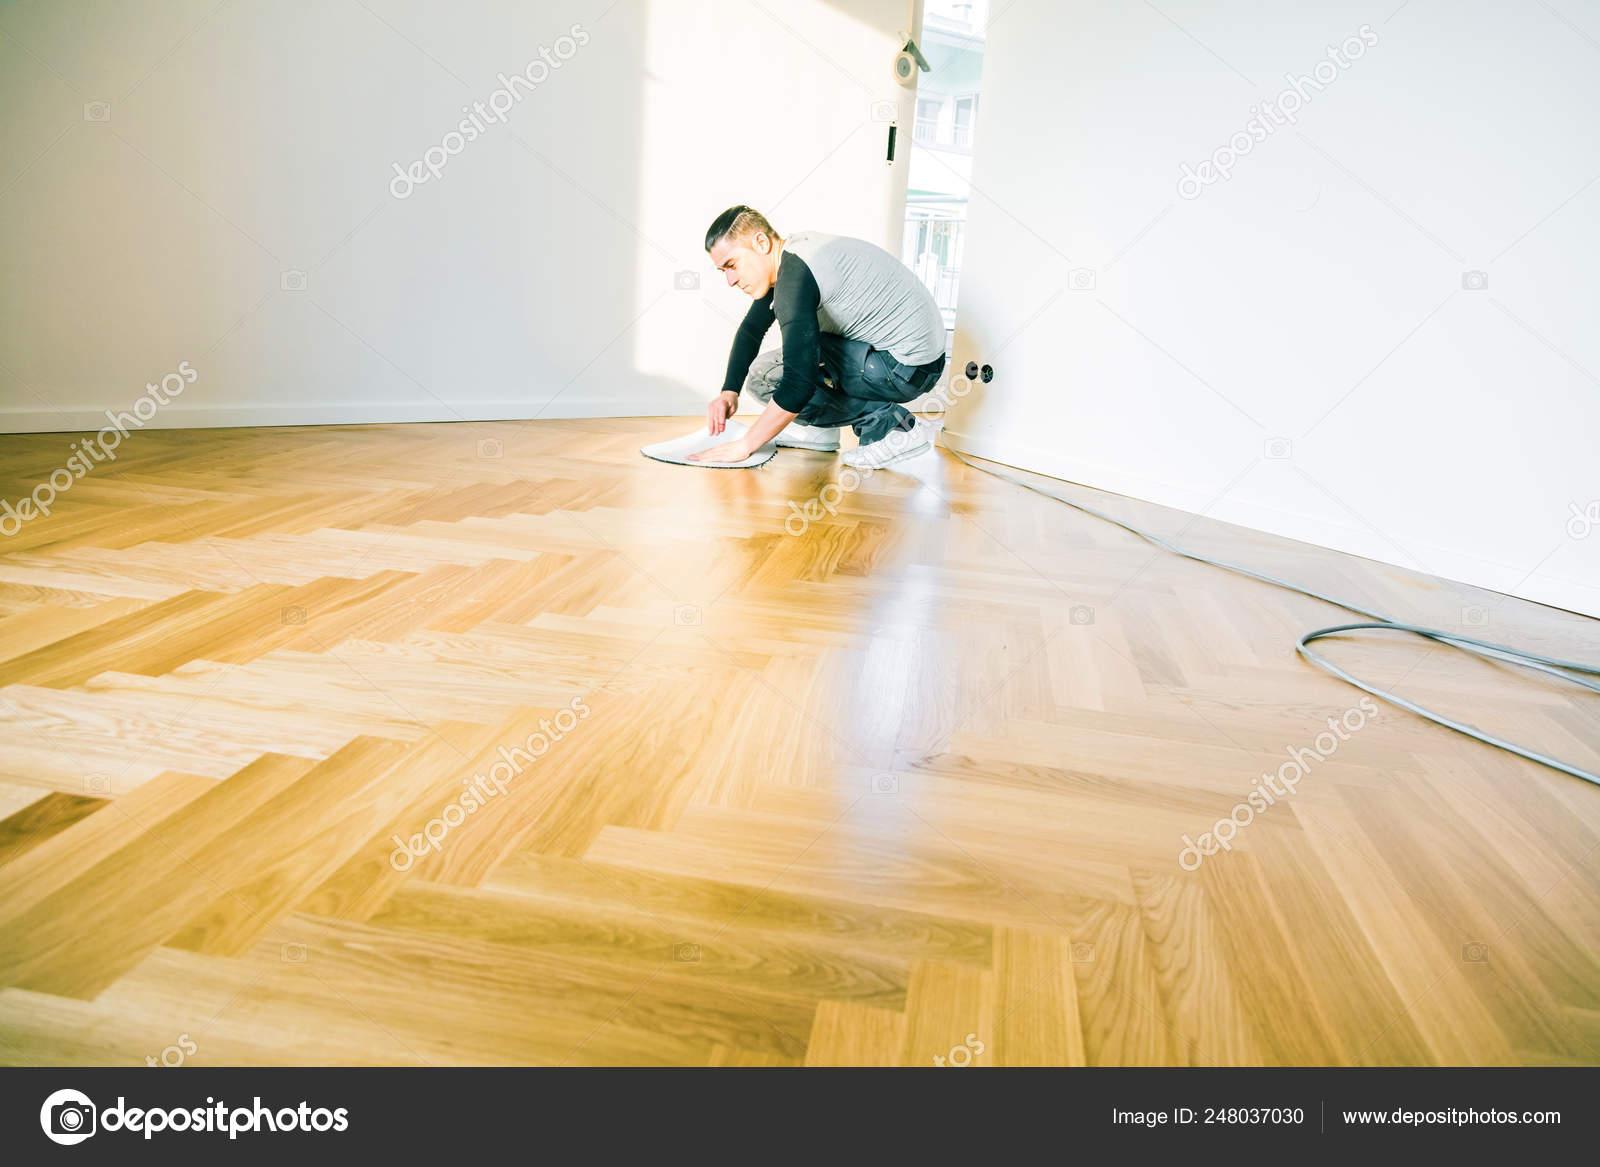 Man Varnishing Oak Parquet Floor Stock Photo C Karepastock